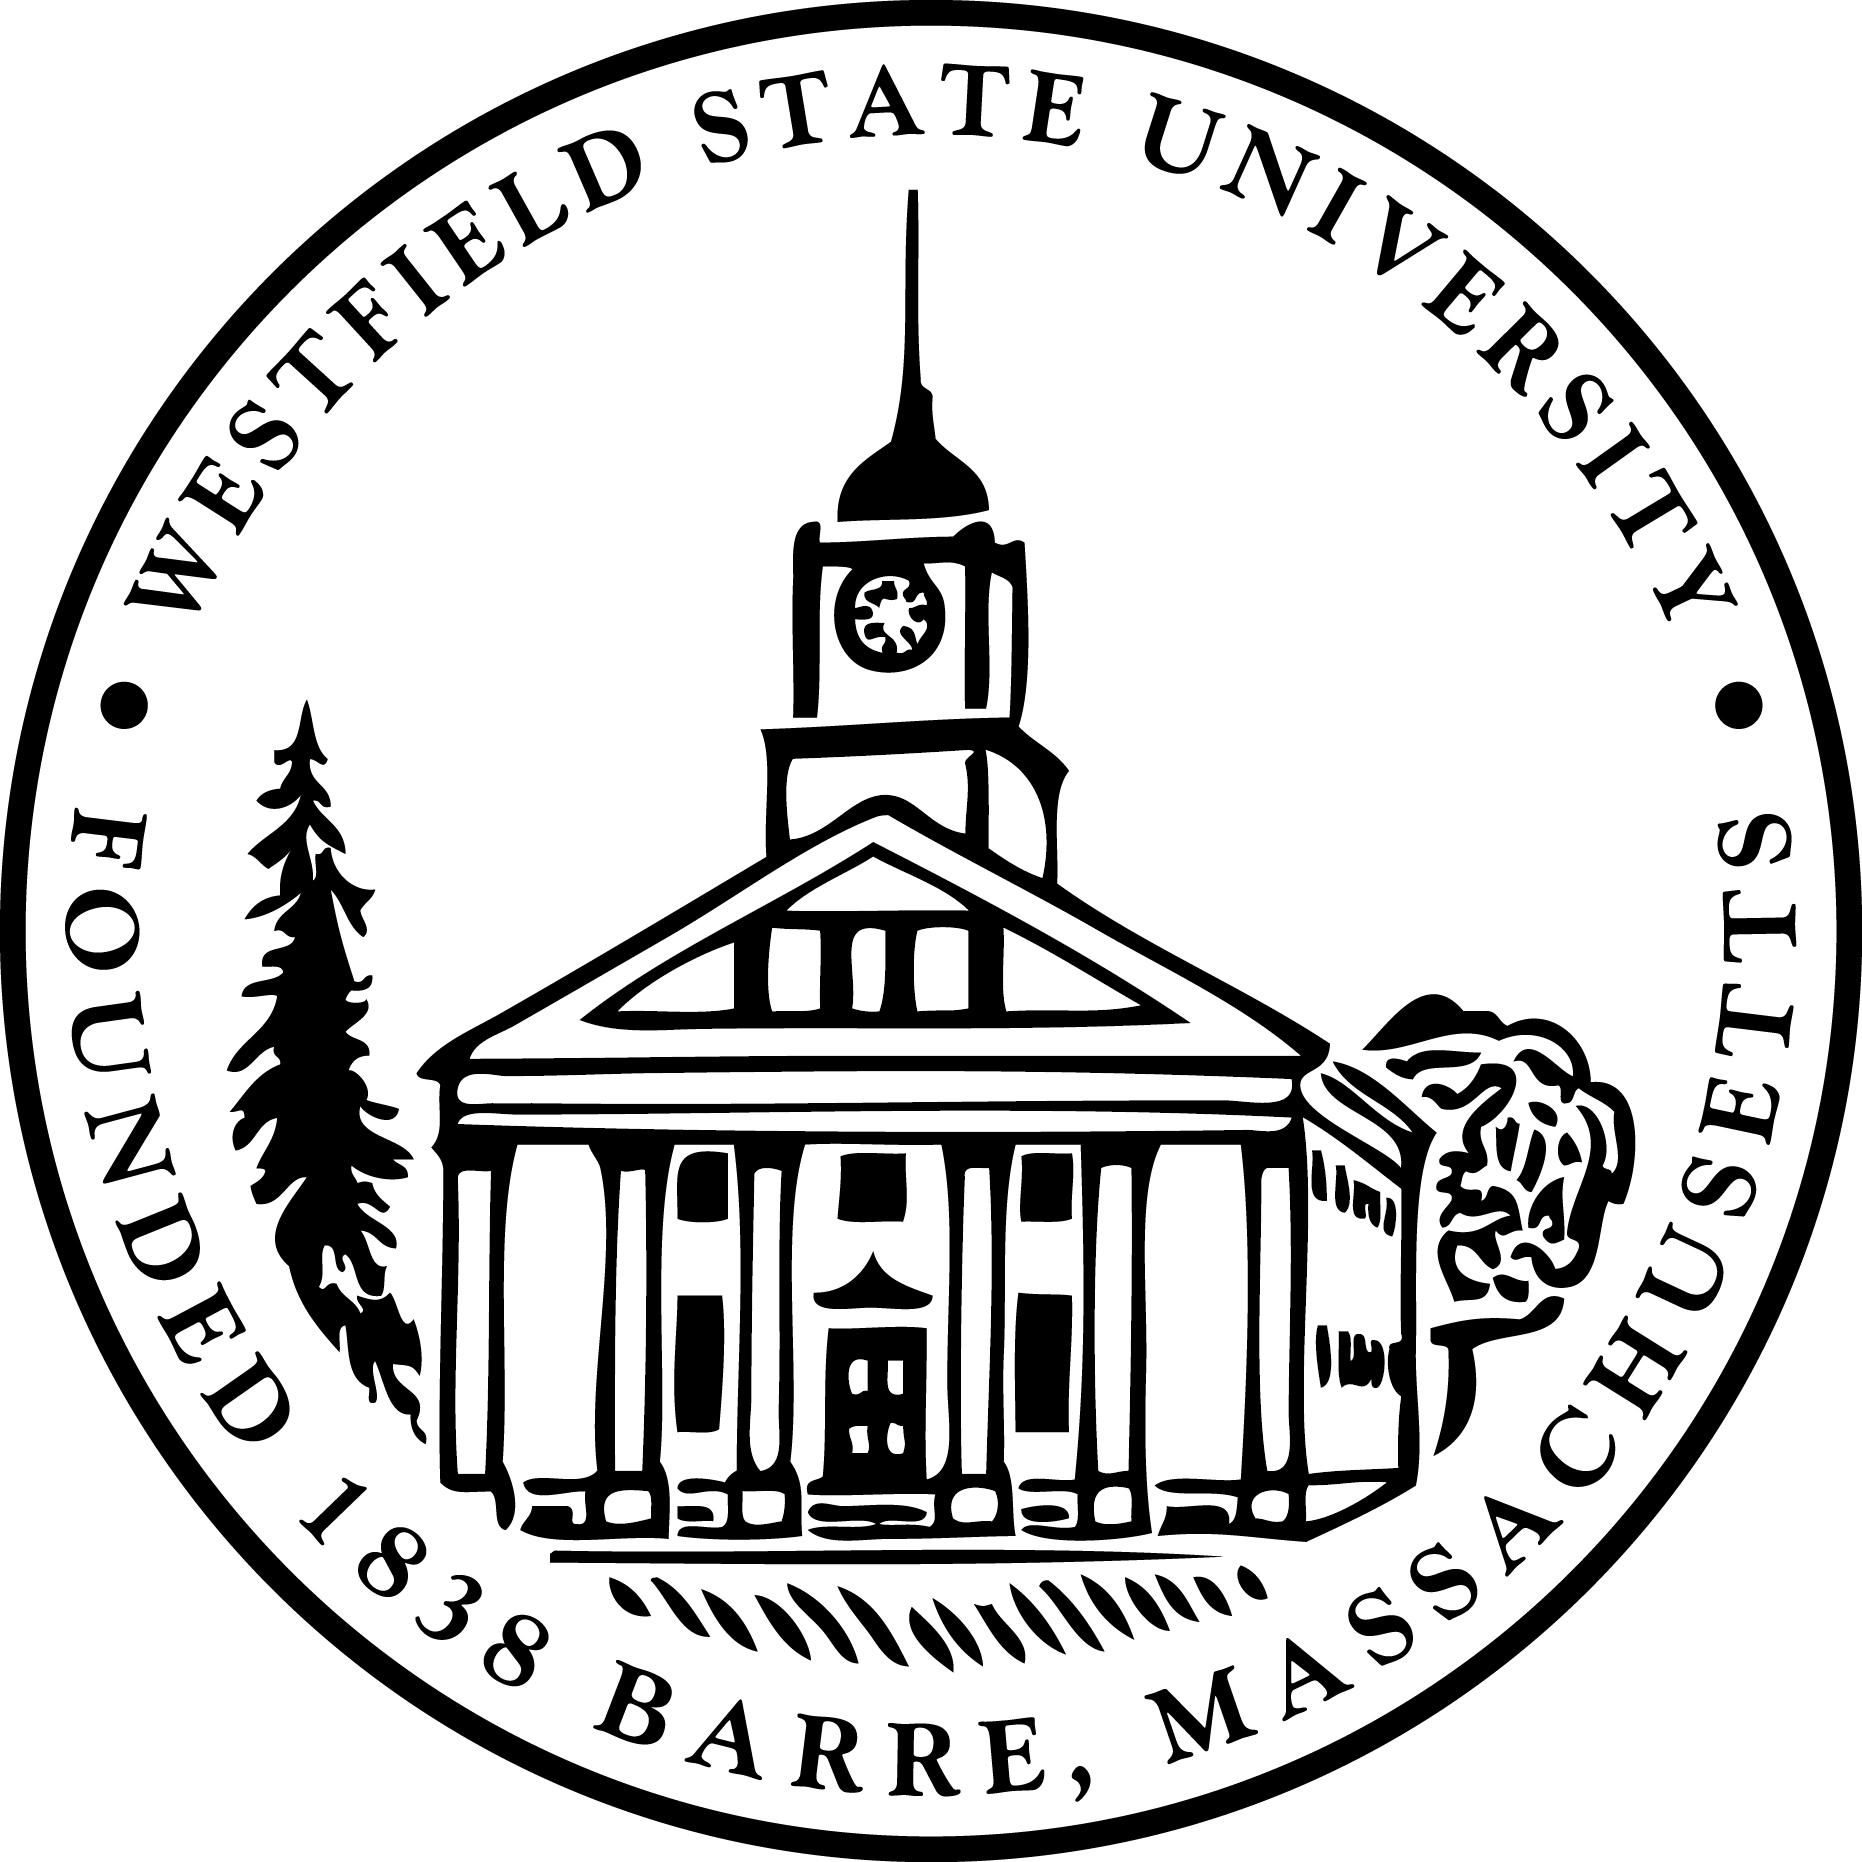 resume michigan state university master of arts in education PE Teacher westfield state university seal